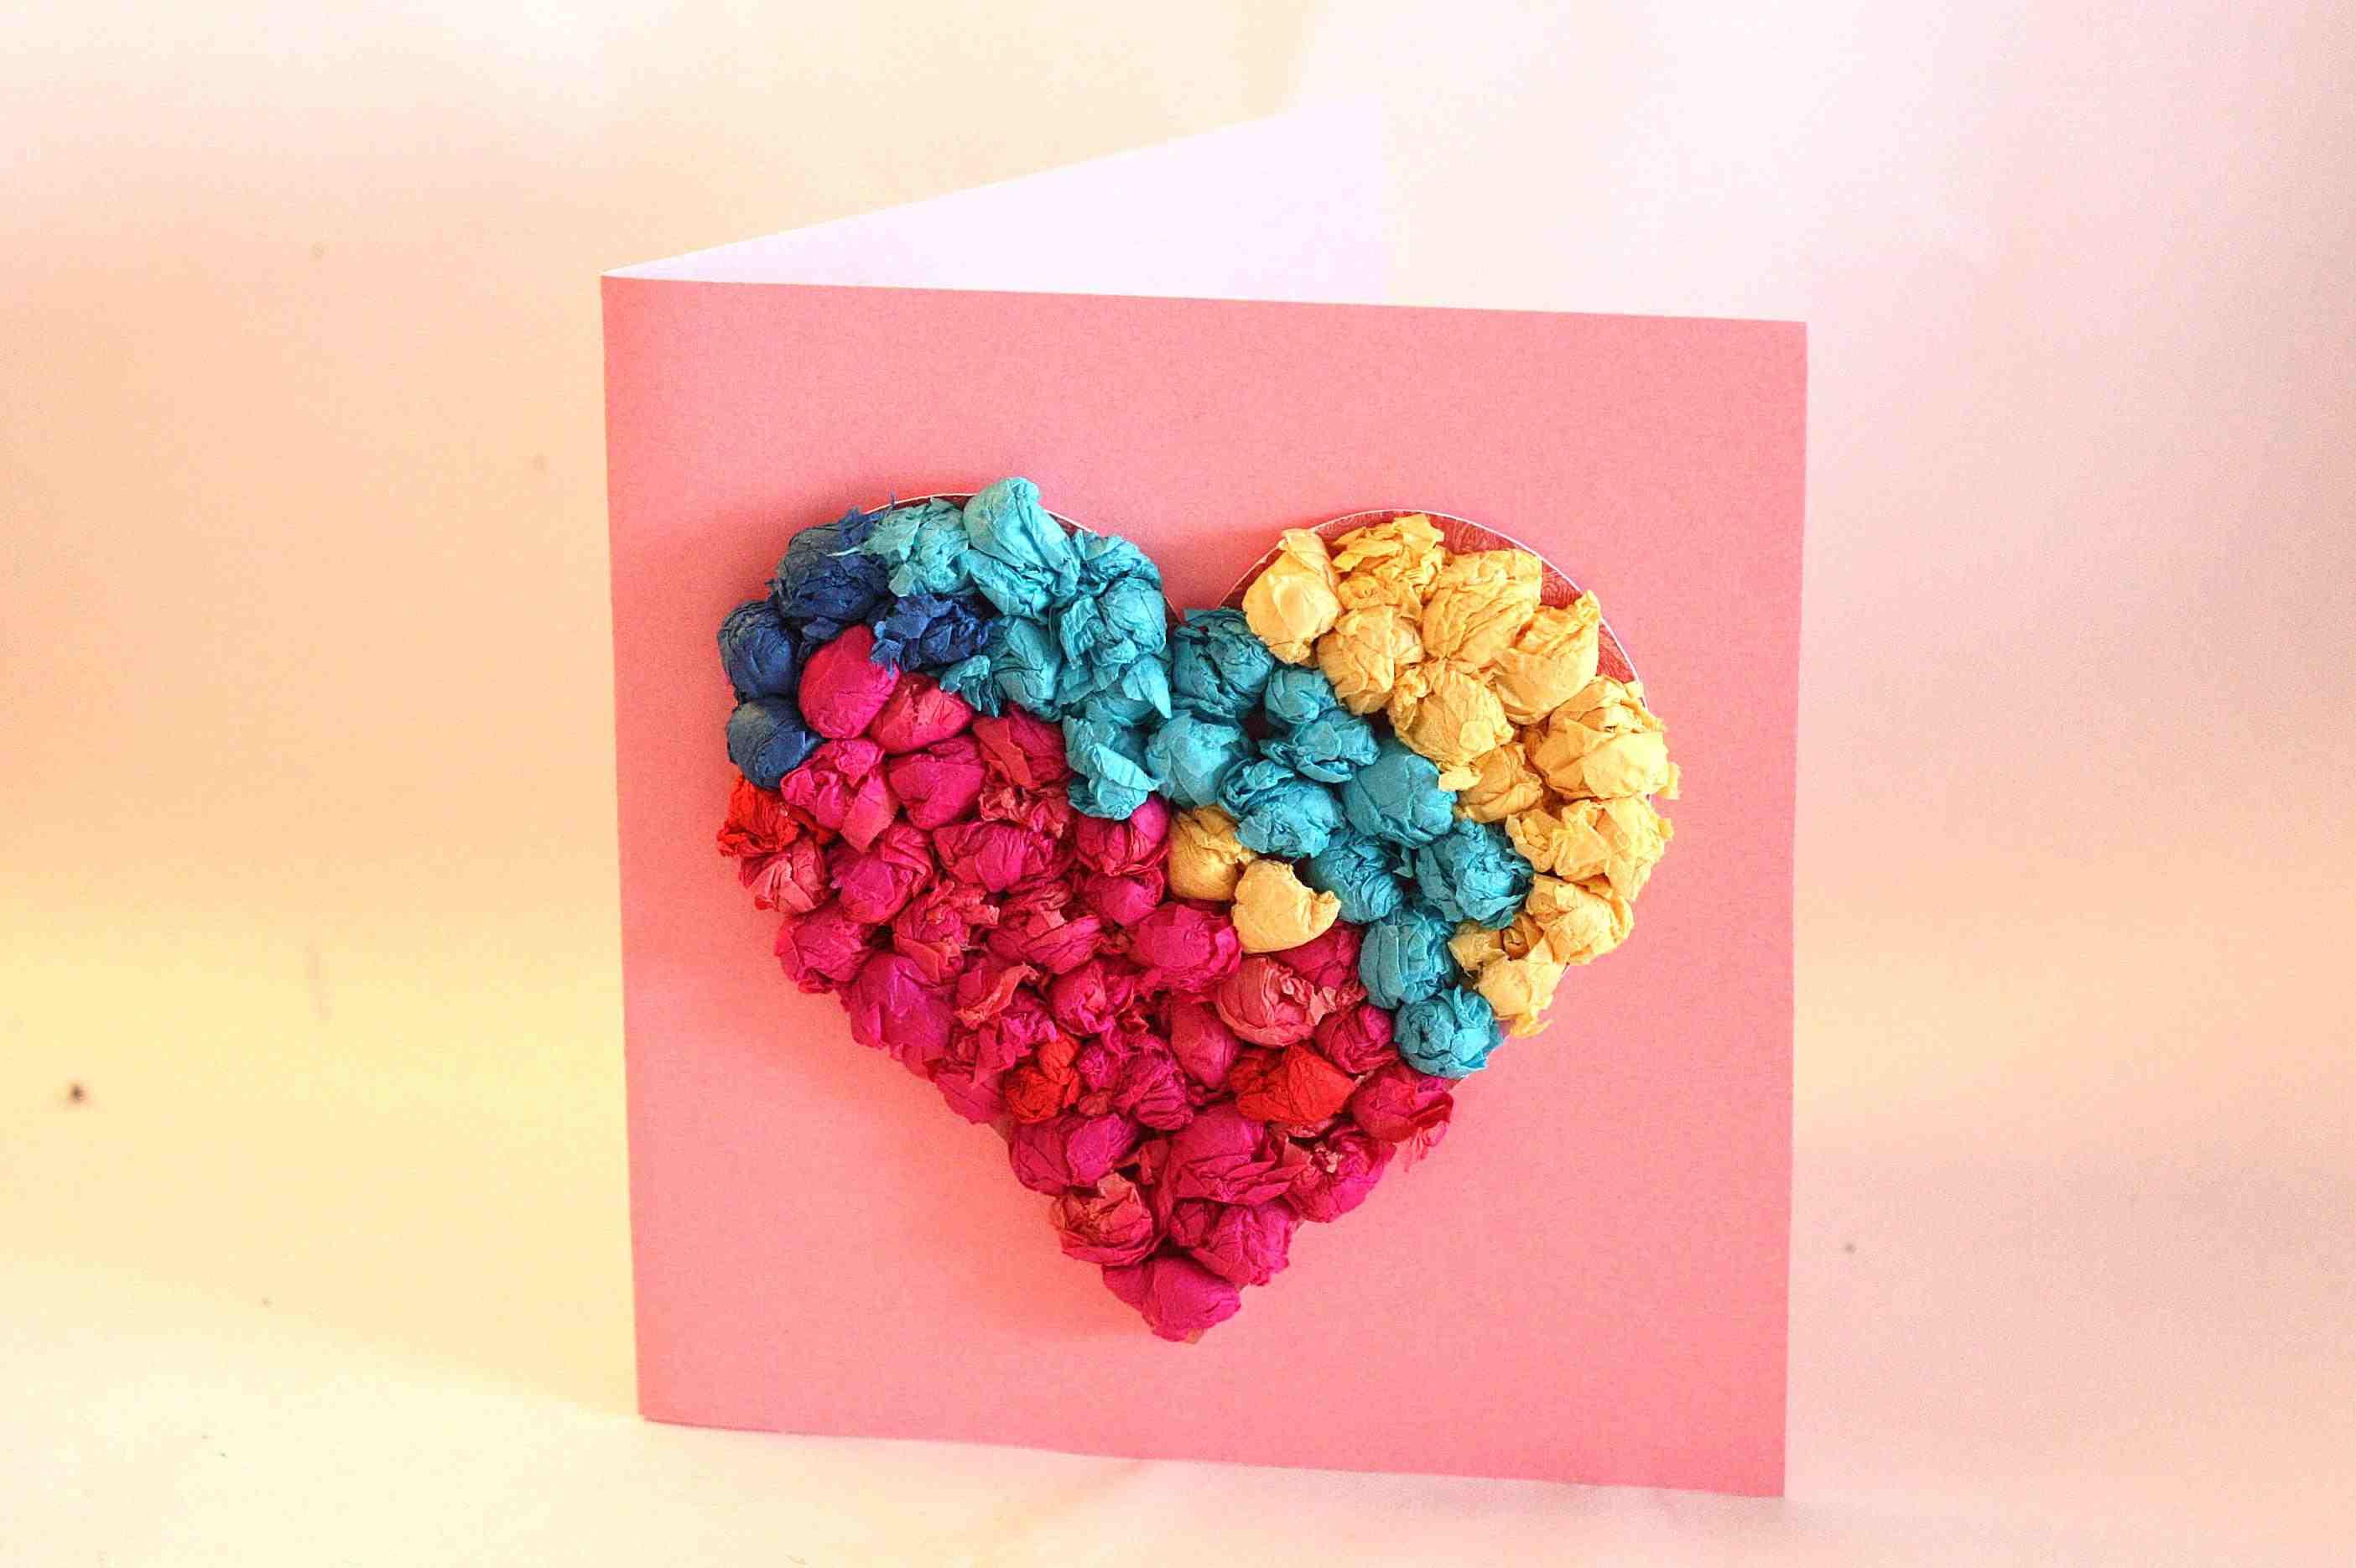 11 Manualidades De San Valentin Para Hacer Con Ninos